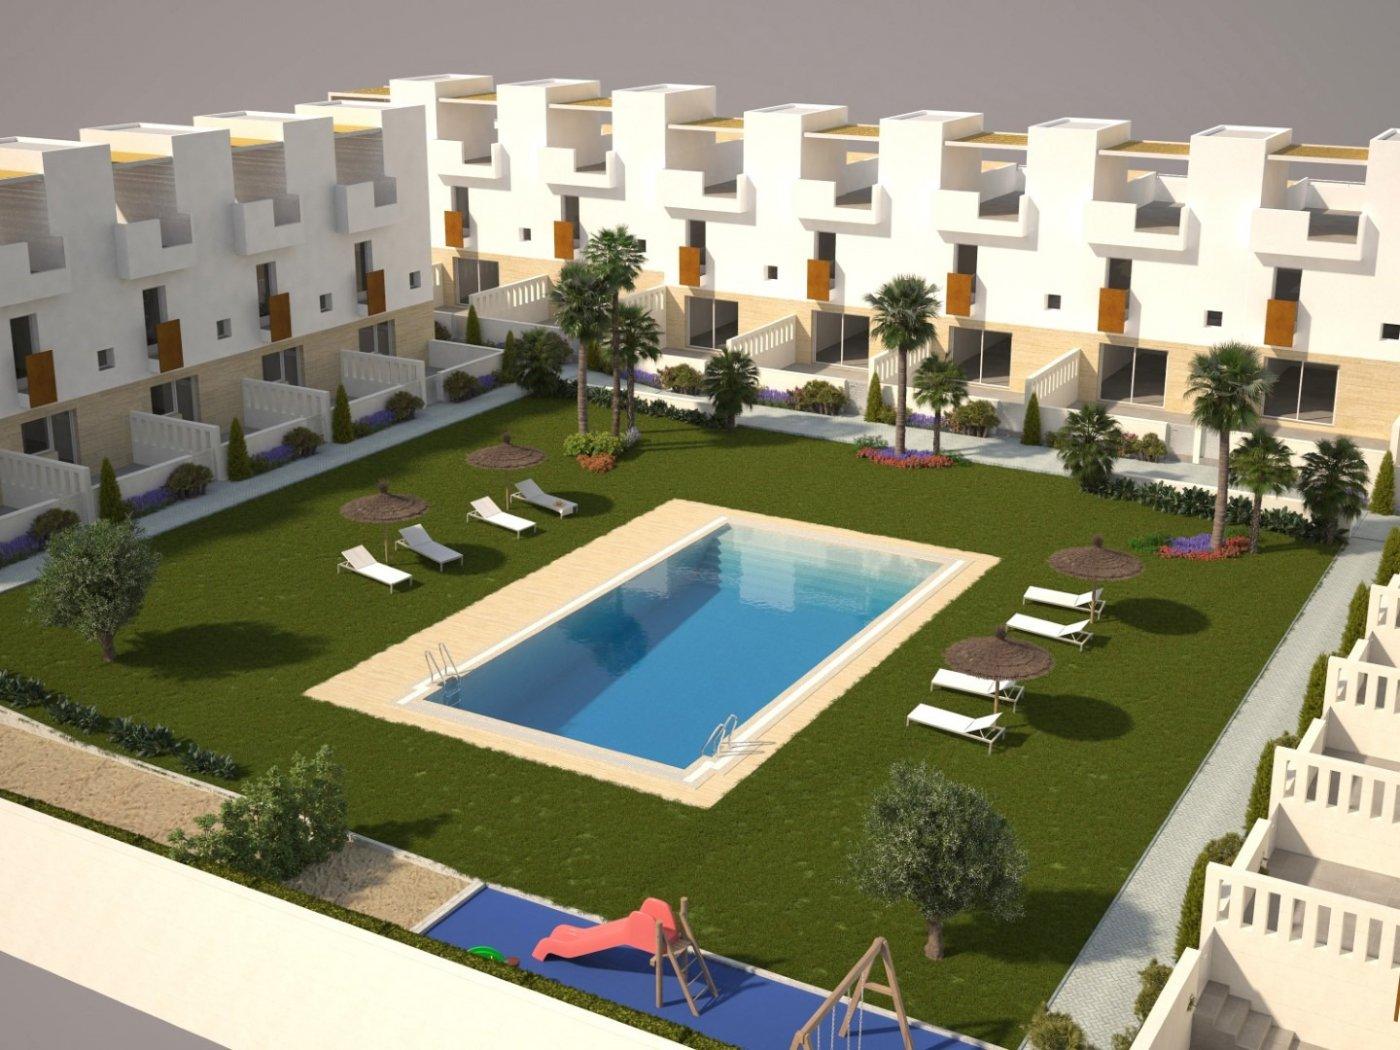 Townhouse - New Build - Torrevieja - Playa de los locos